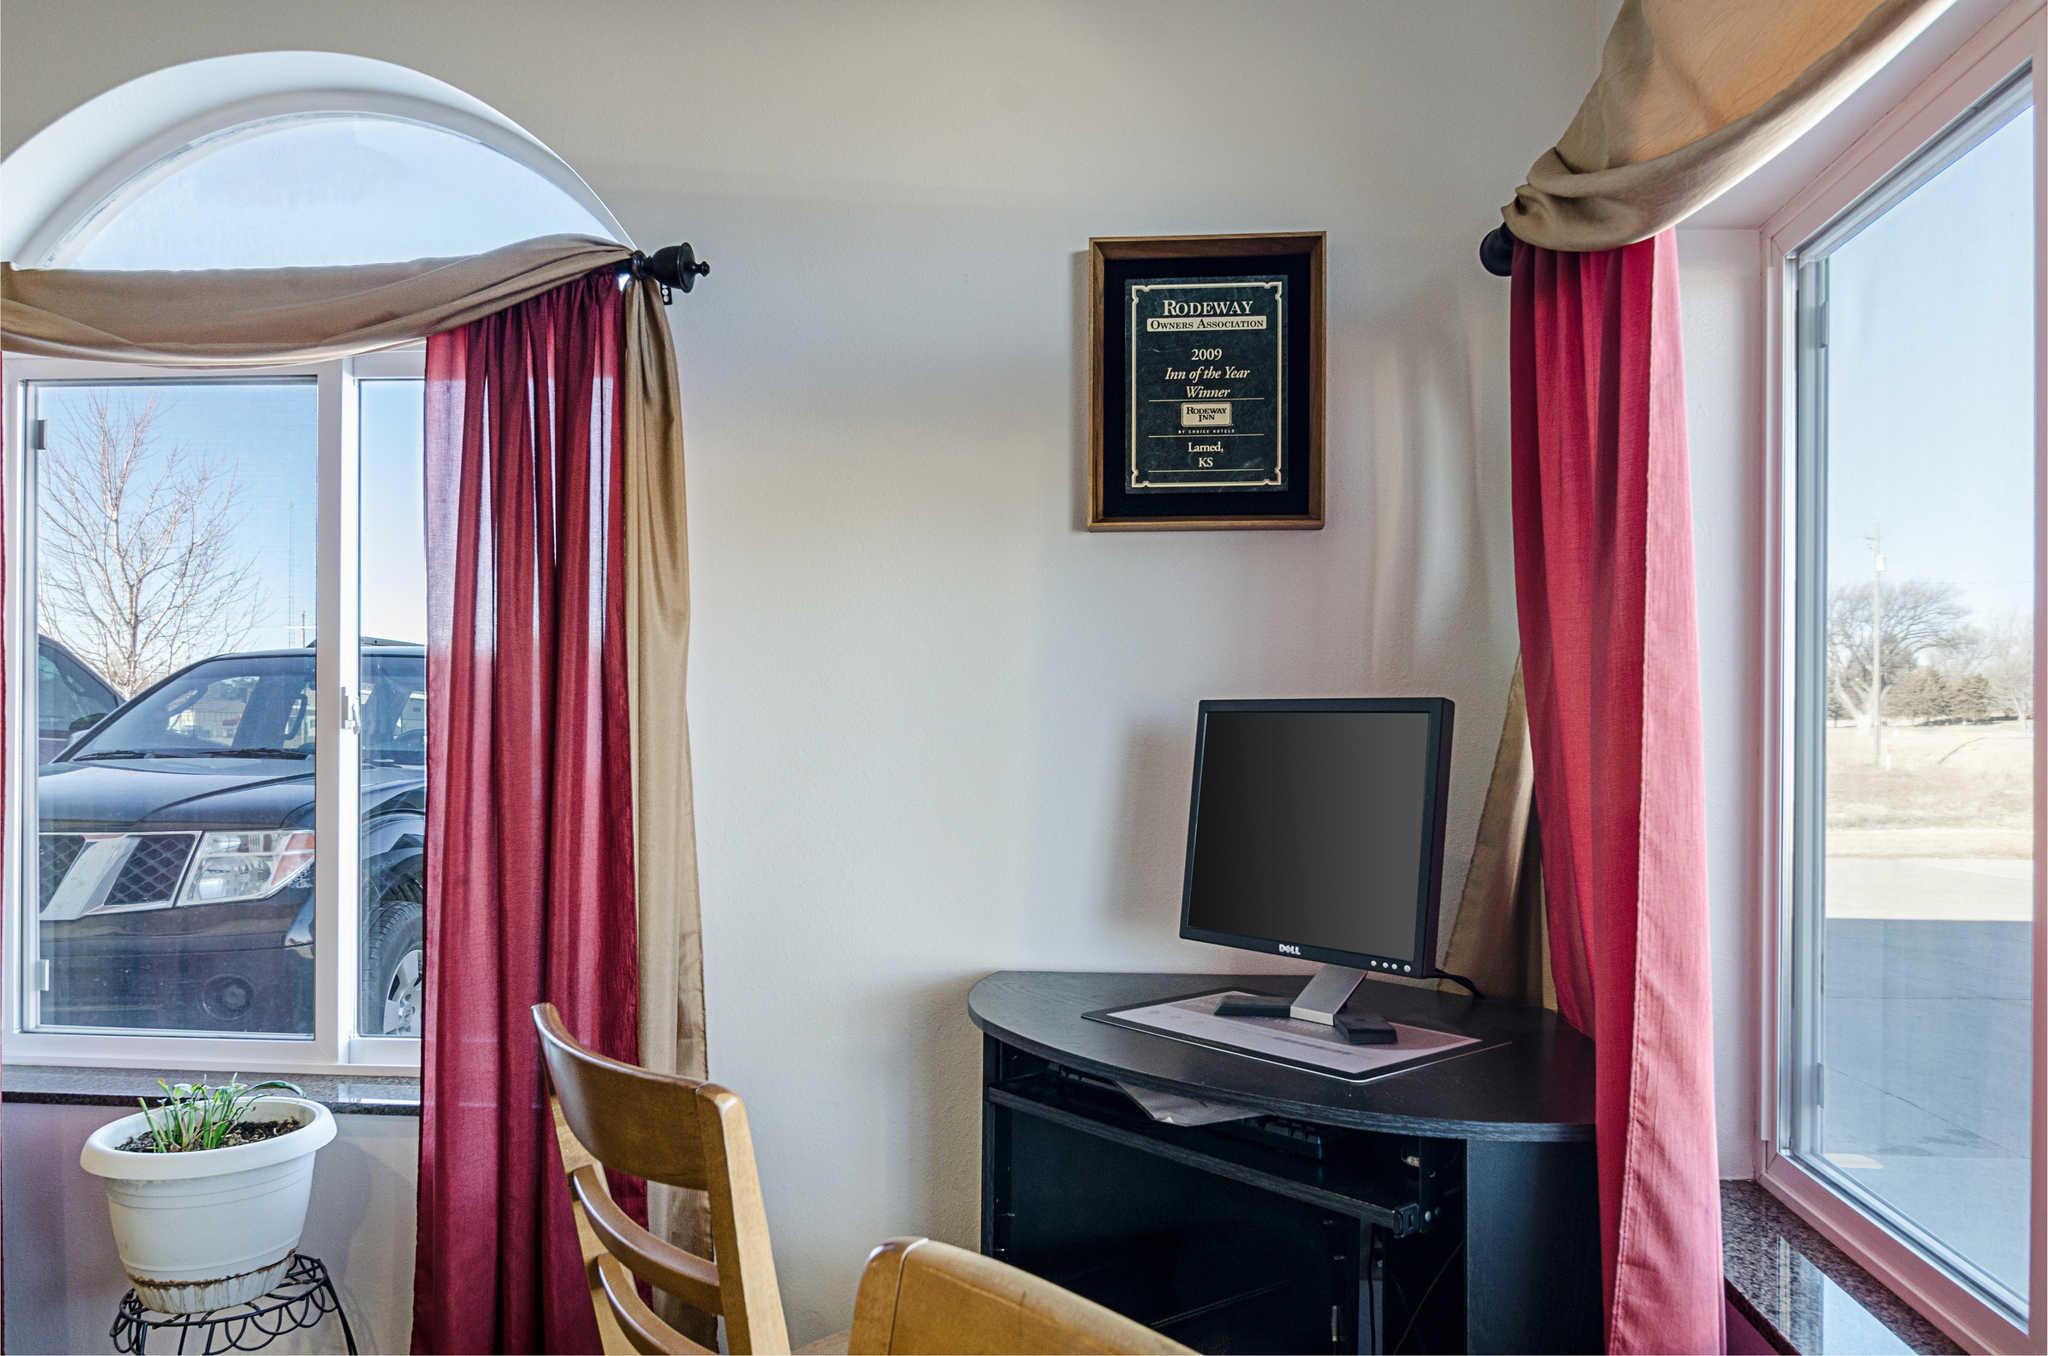 Rodeway Inn image 32